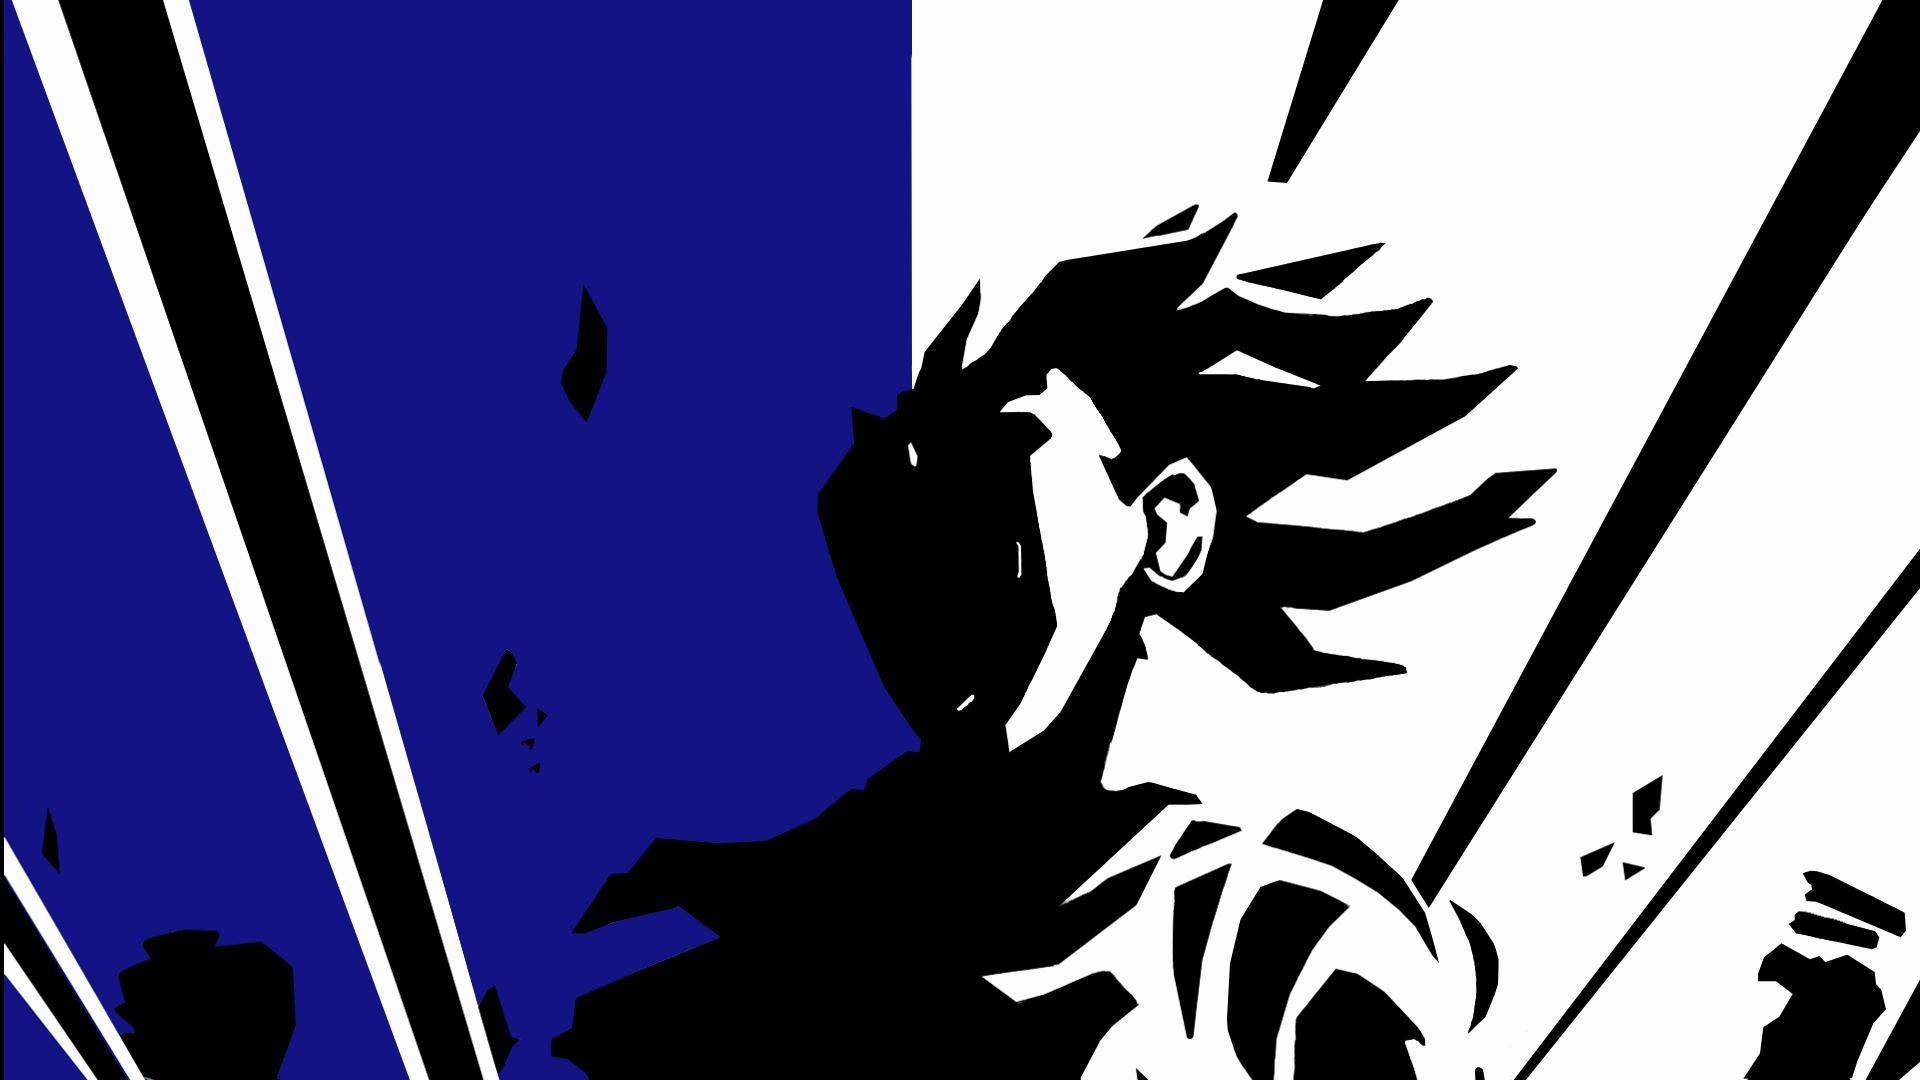 Best-Goku-hd-for-PC-Dragon-Ball-Z-wallpaper-wp640614